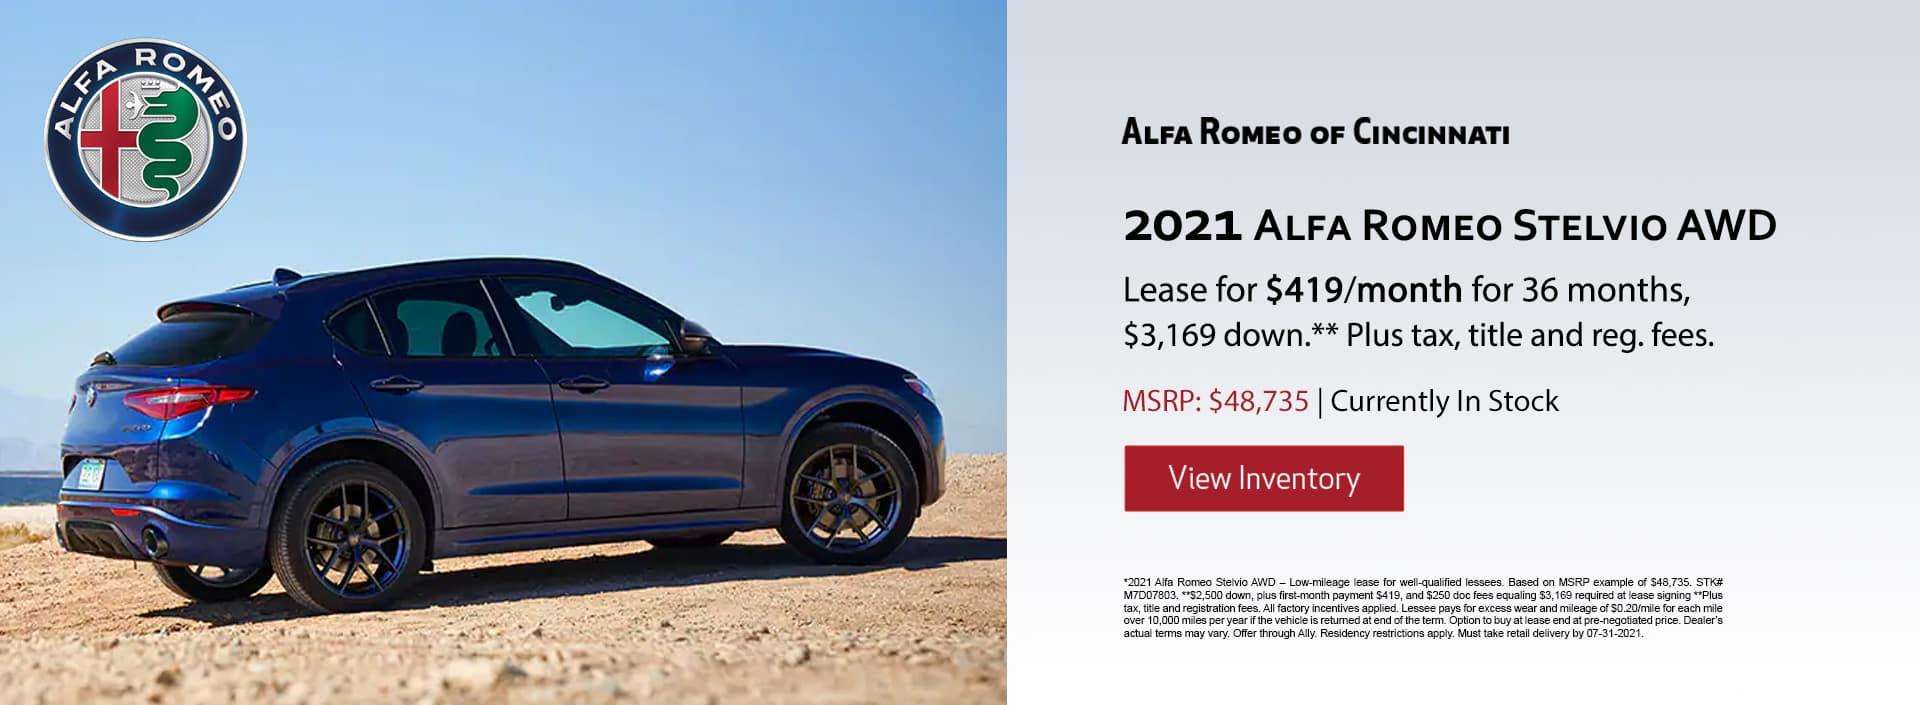 Alfa-Romeo-Lease-Slides-July21_v2_Stelvio-Recovered